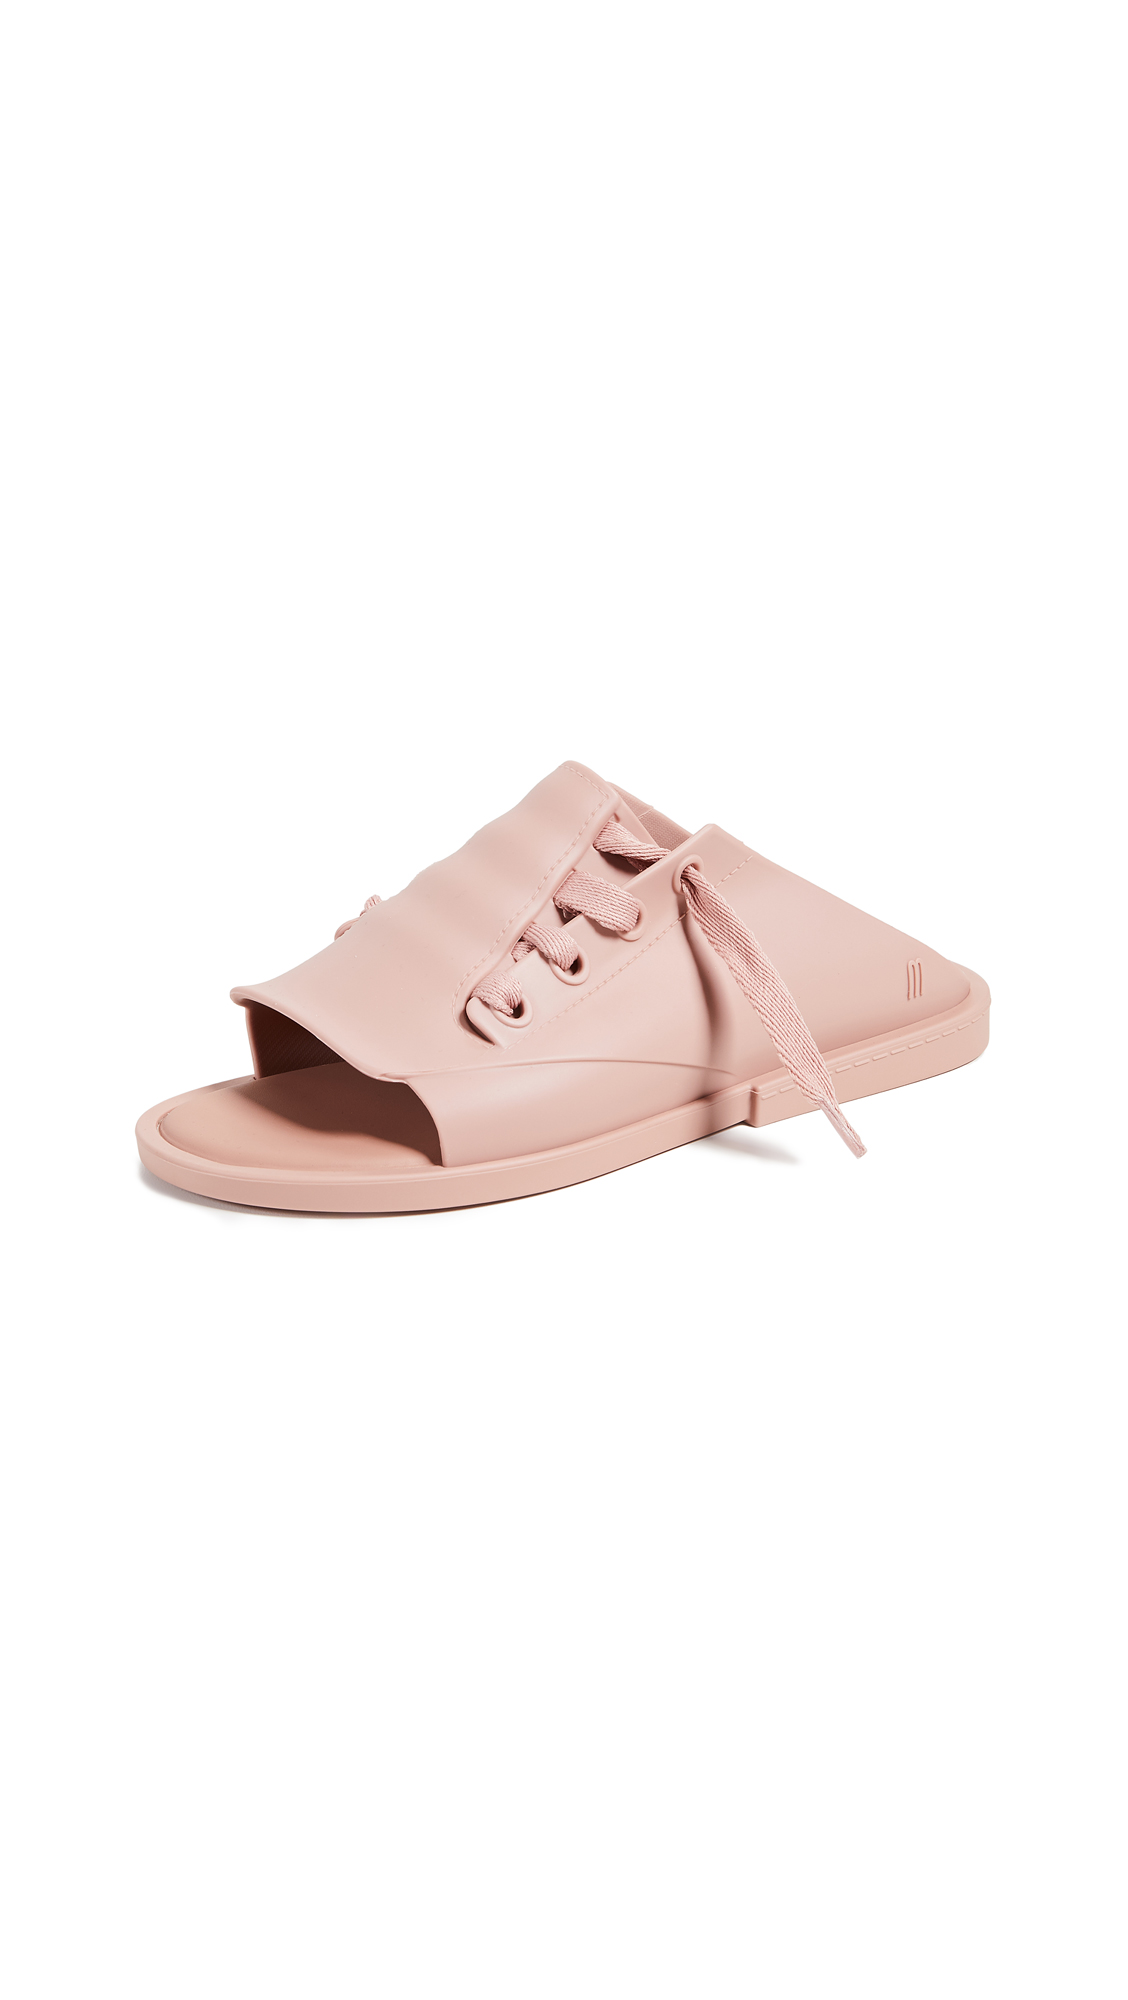 Melissa Ulitsa Slide Sandals - Pink